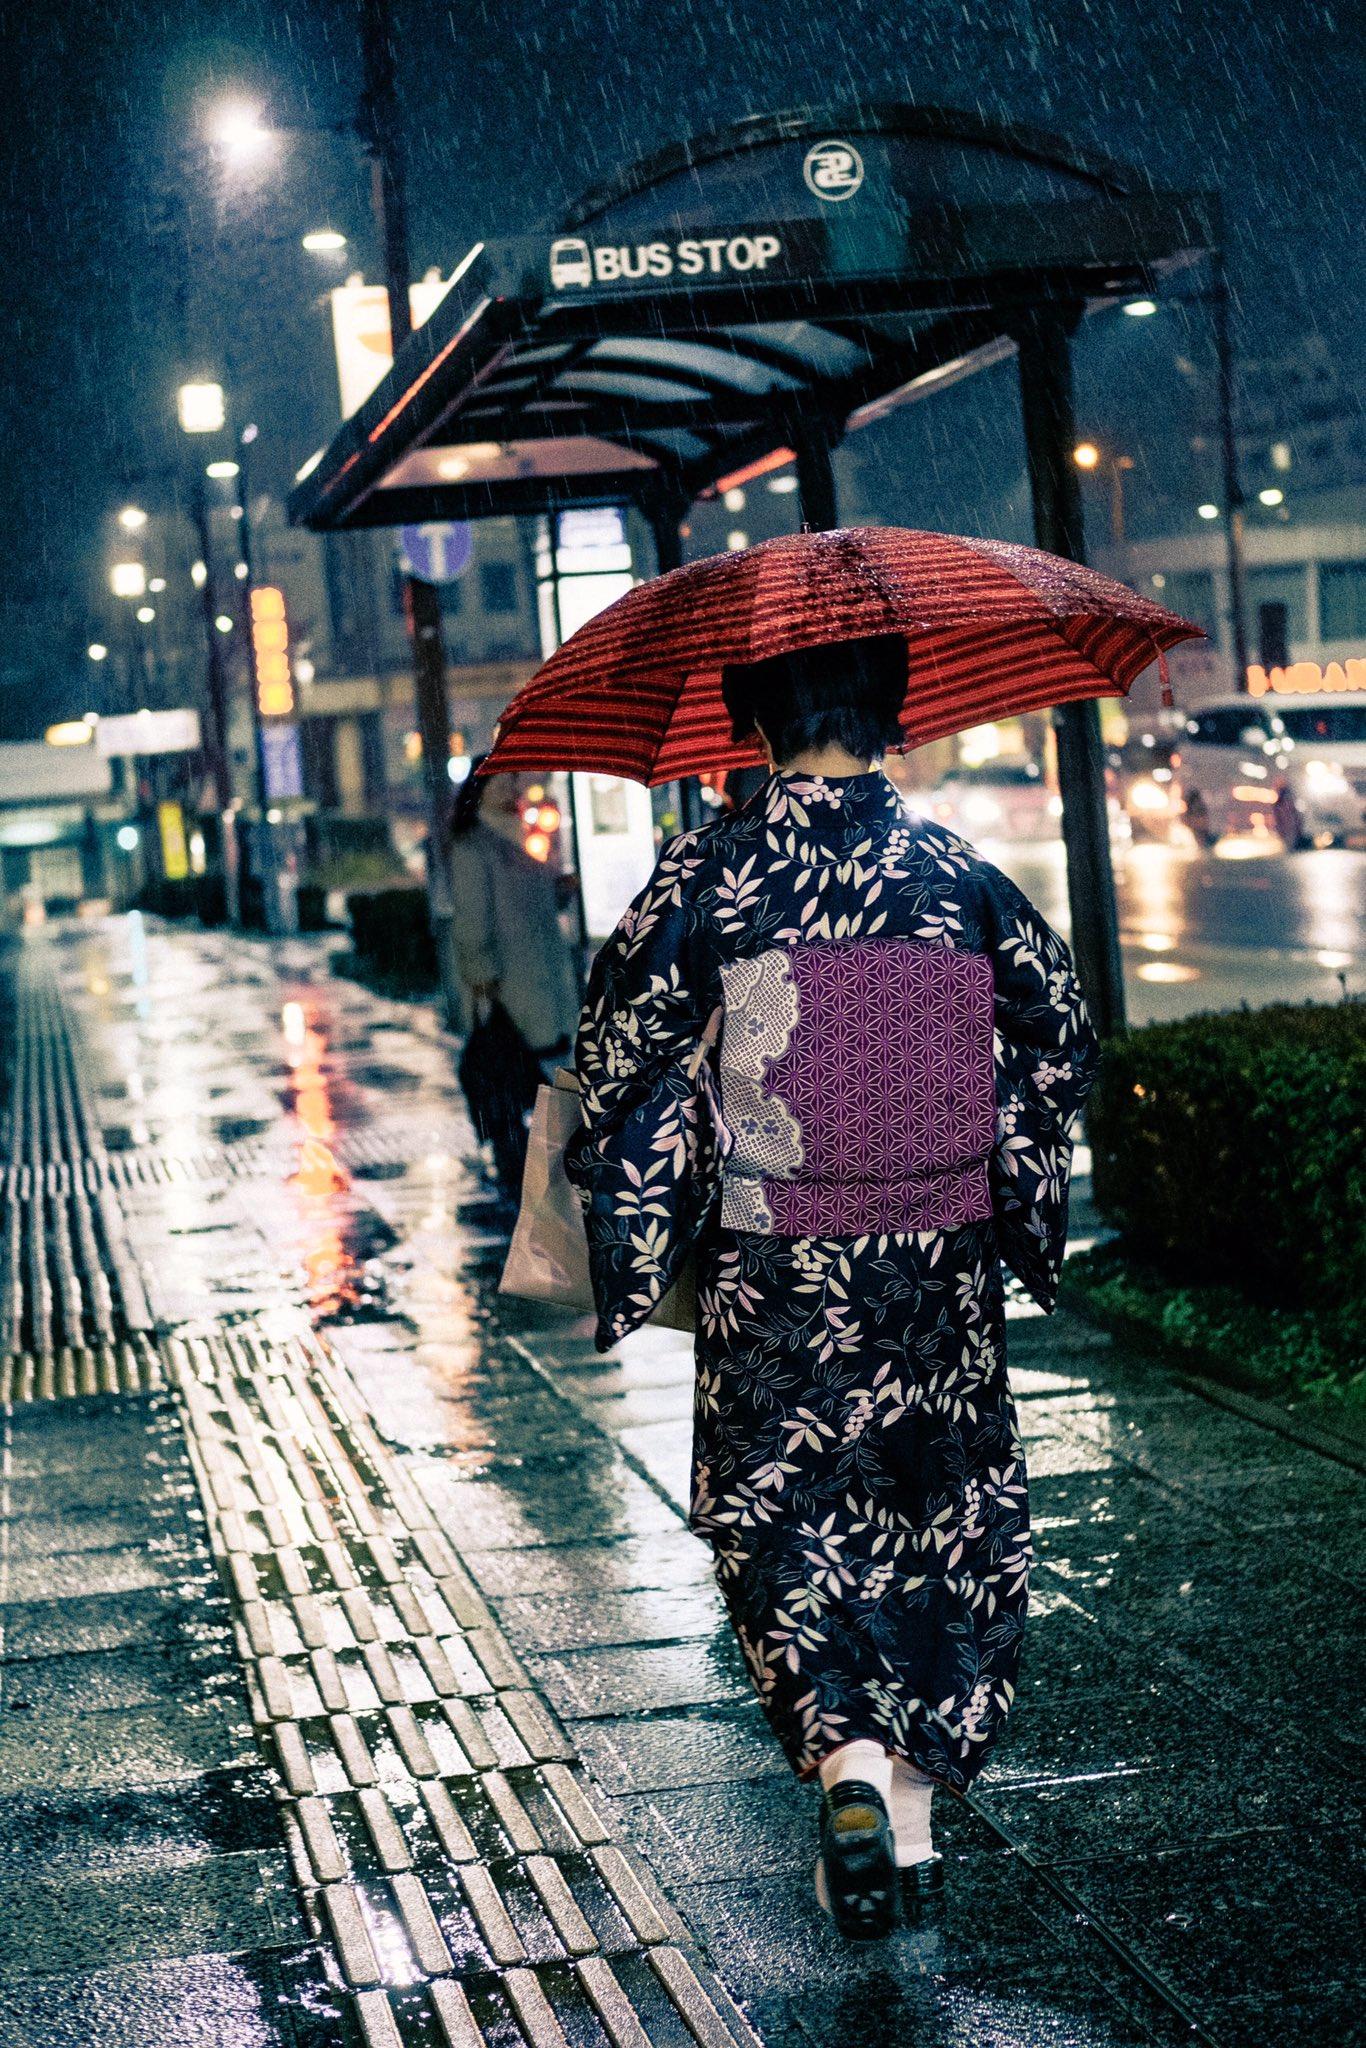 urban_street_photography_18.jpg